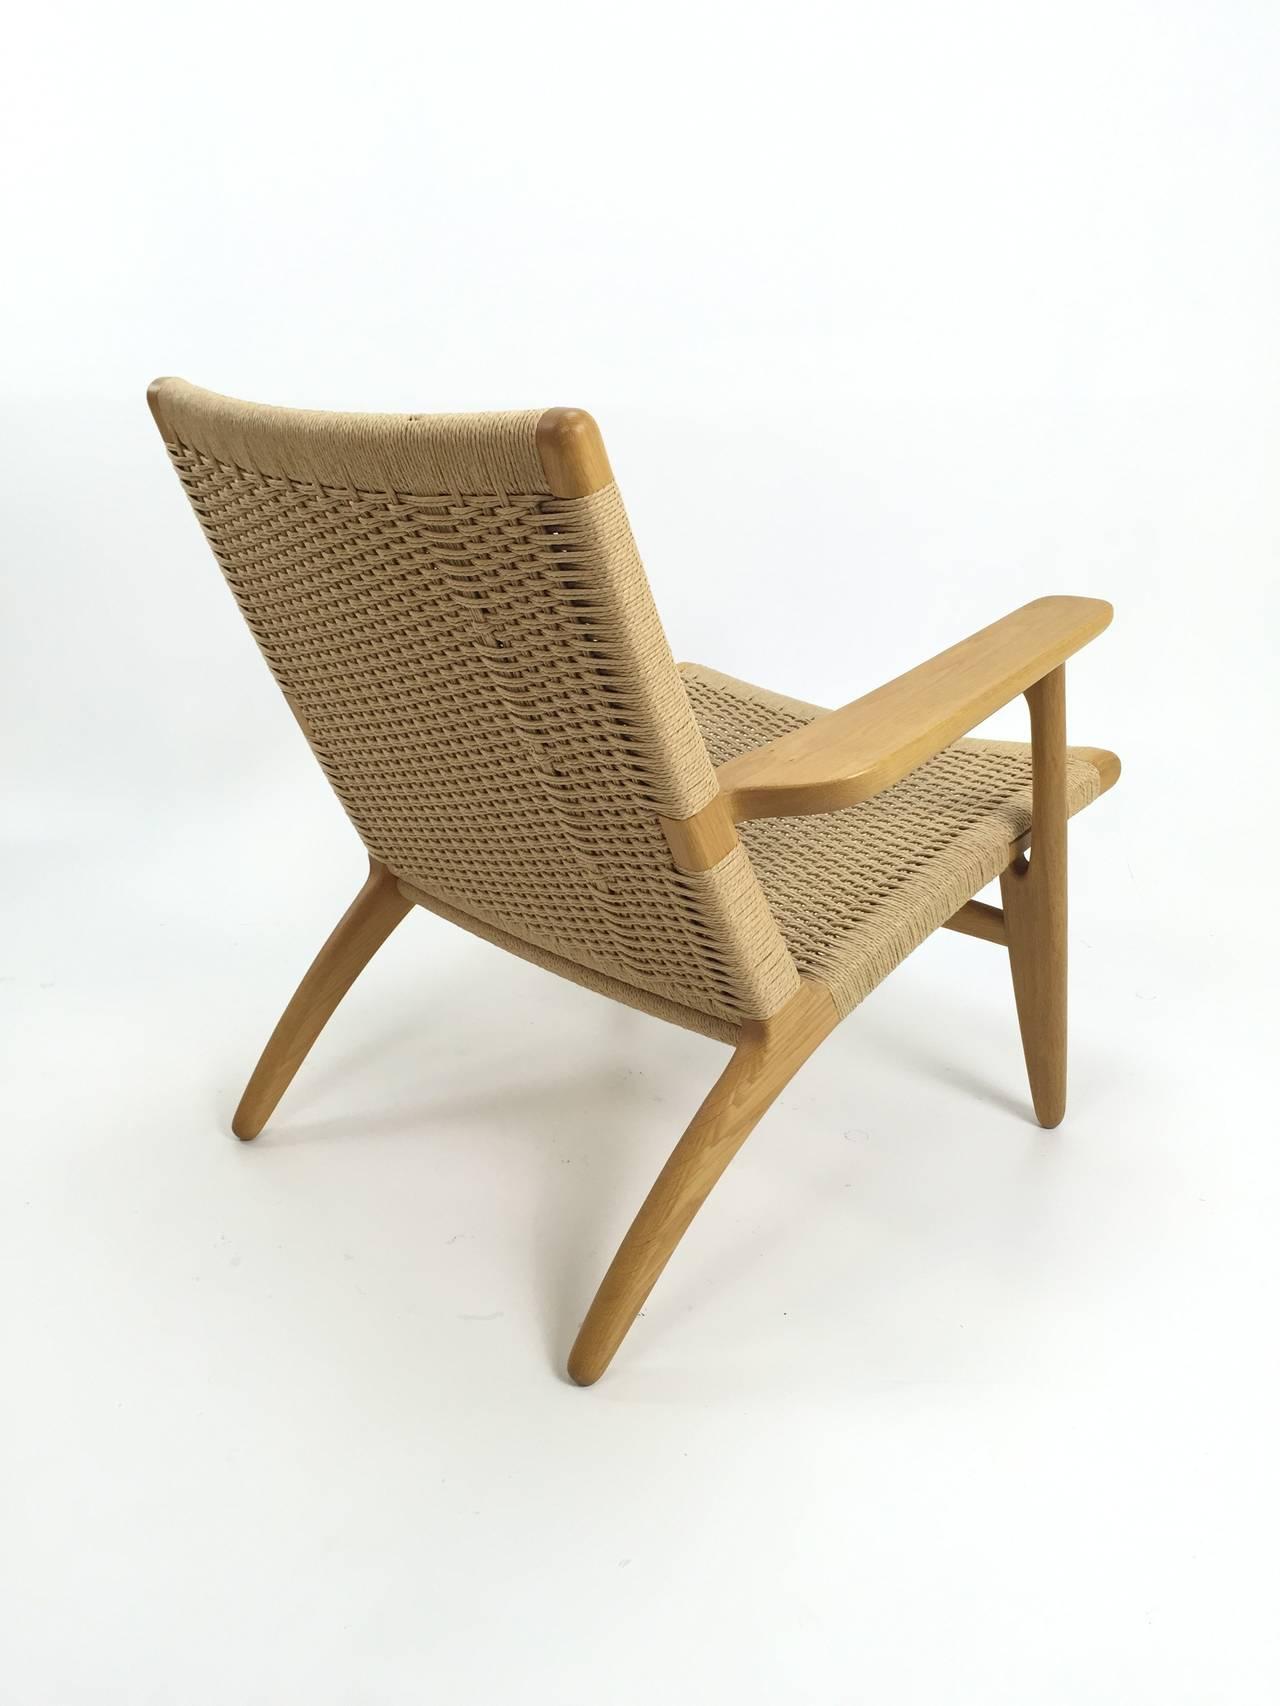 pair of hans wegner ch25 chairs for carl hansen at 1stdibs. Black Bedroom Furniture Sets. Home Design Ideas